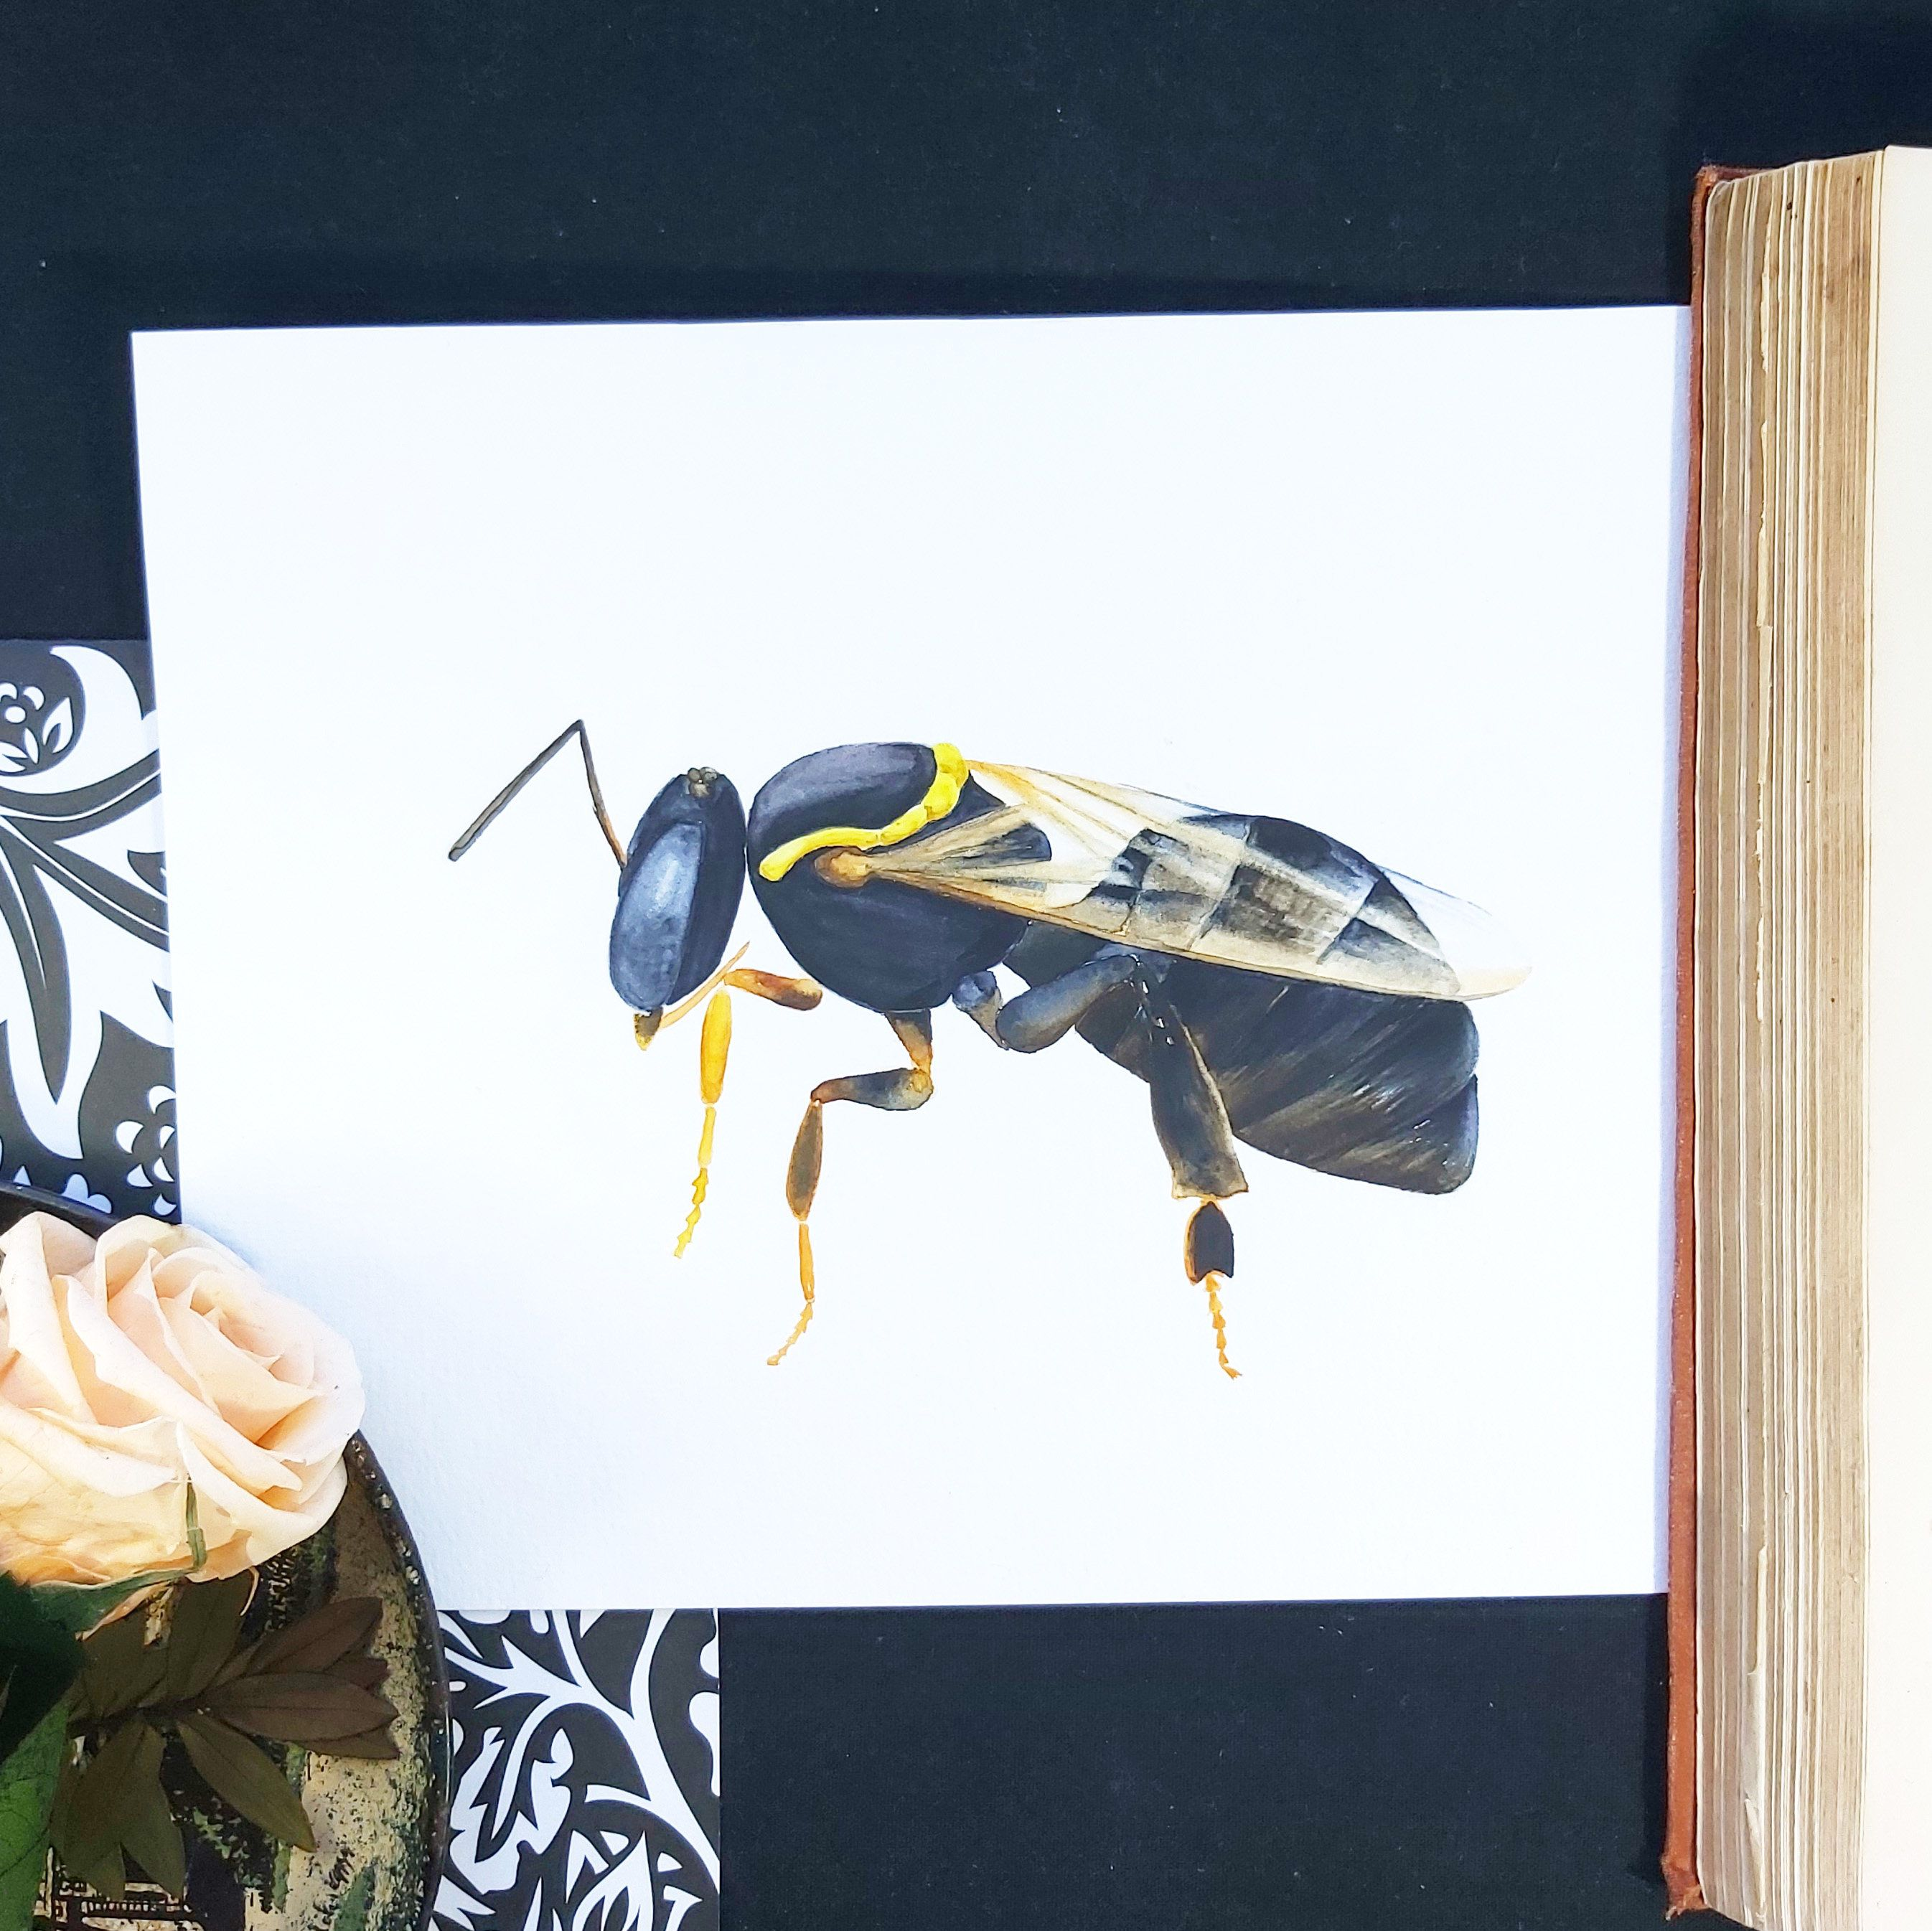 Watercolour painting   Australian native Sugar-bag bee (24 x 16cm)   Wildlife illustration   Natural world design   Original drawing #GardenCreatures #NativeBee #ColeopteraPoster #InsectLoverArt #BeeKeeping #InsectStudy #AussieAnimals #SocialSpecies #VictorianInsect #PollinatorArtwork